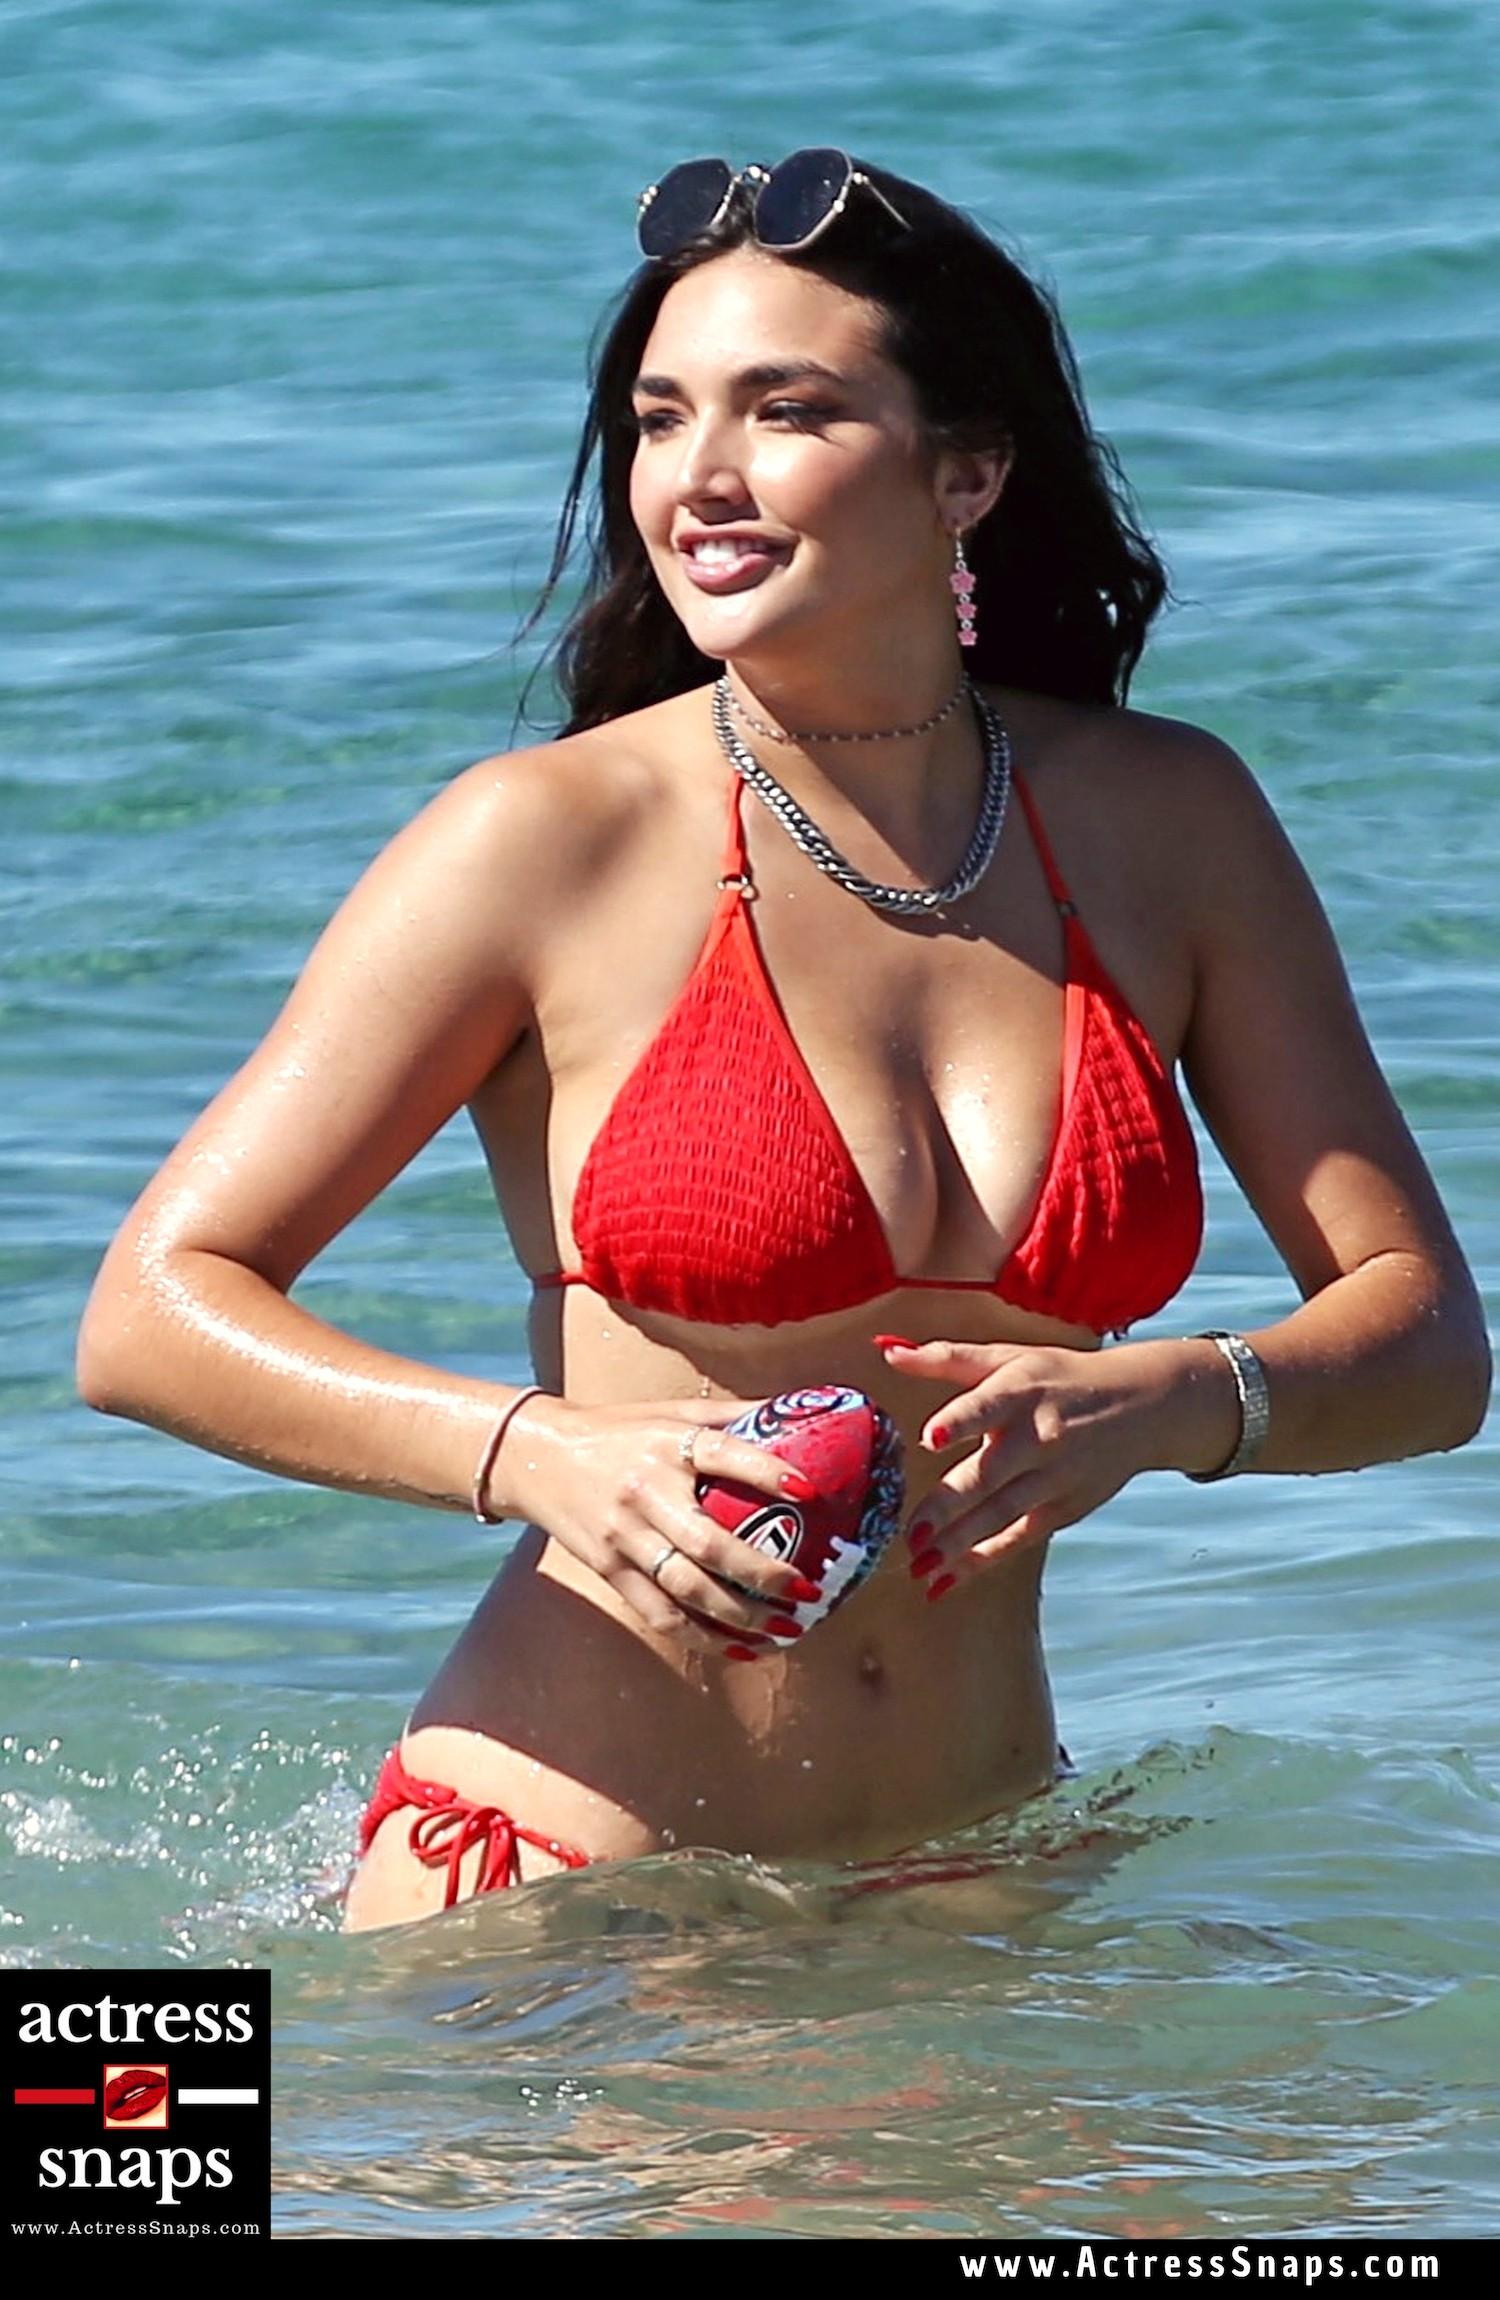 Sexy Hailee Lautenbach Bikini Photos - Sexy Actress Pictures   Hot Actress Pictures - ActressSnaps.com